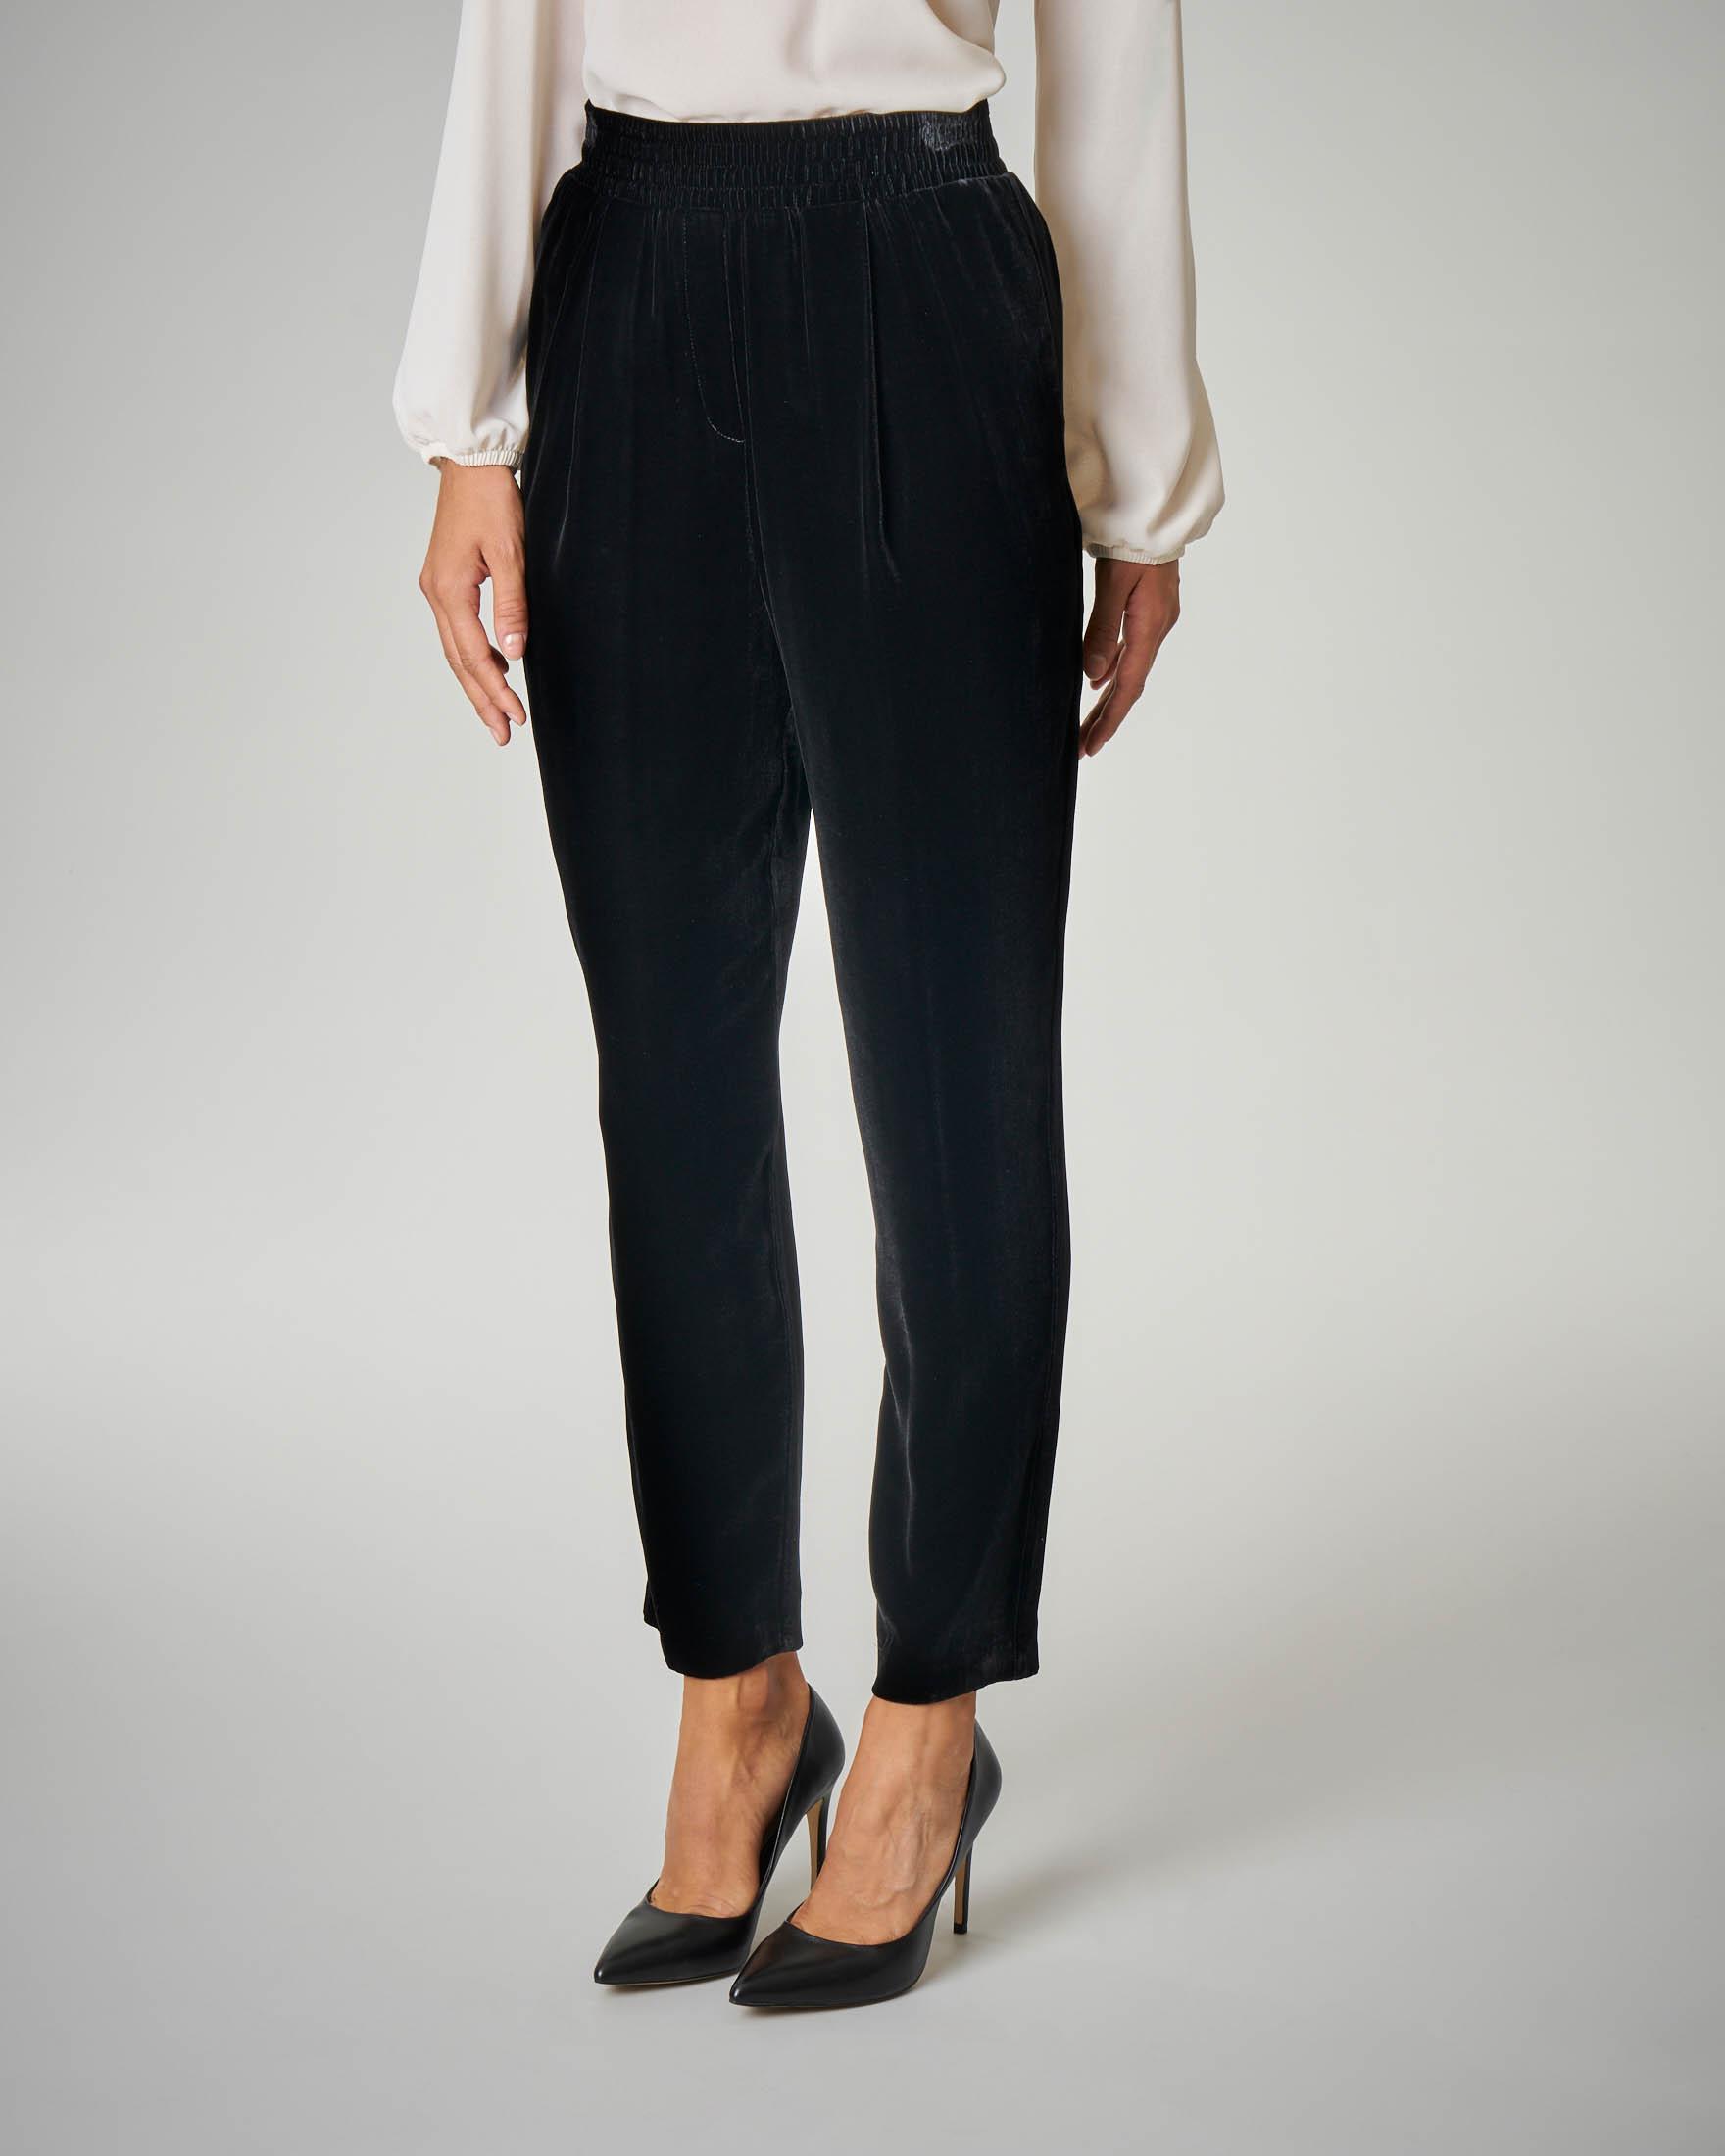 Pantalone nero in velluto liscio